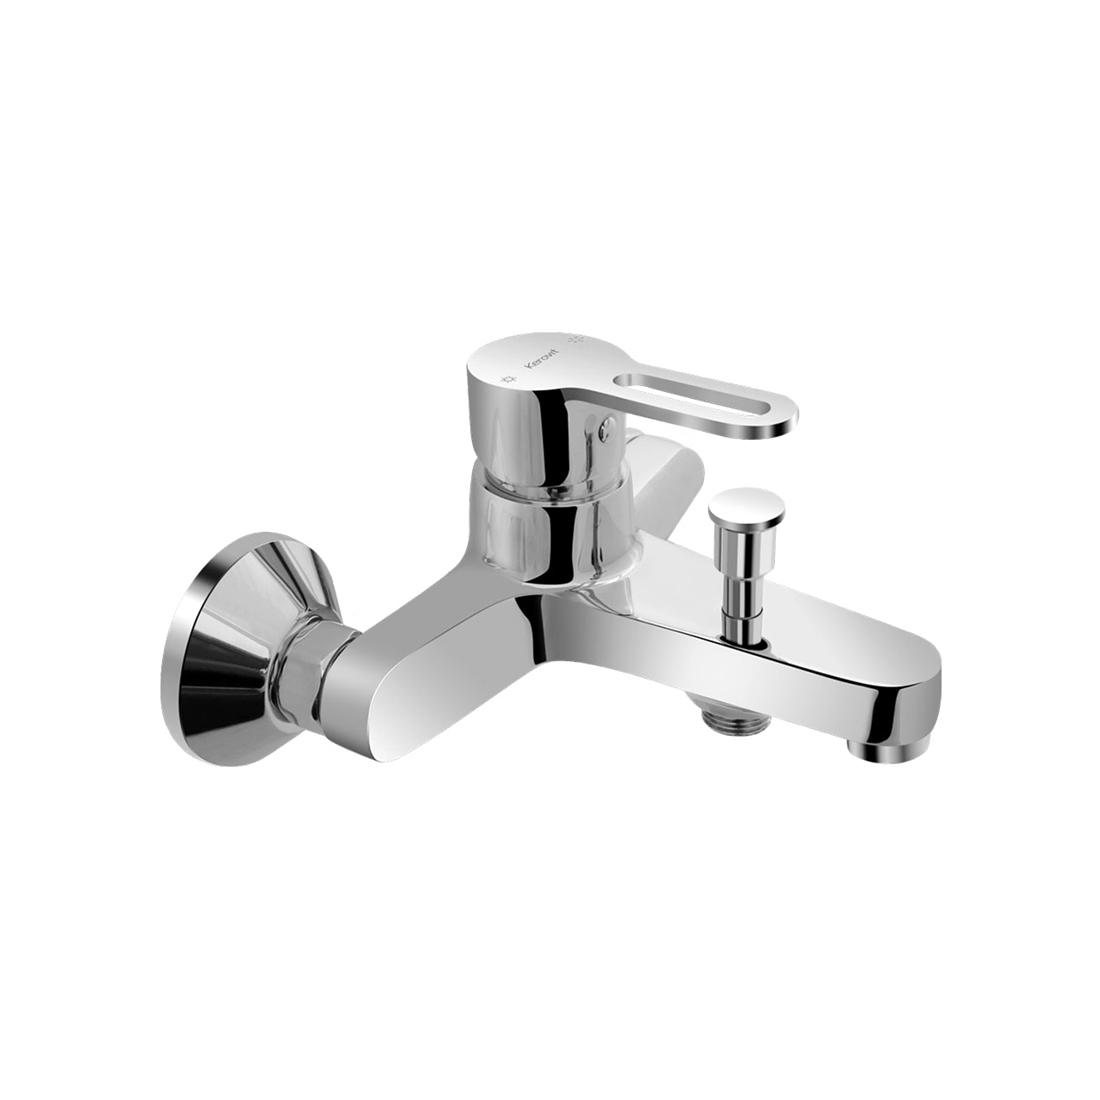 Kerovit Curve KB1711044 Single Lever Bath and Shower Mixer With Hand Shower Arrangement